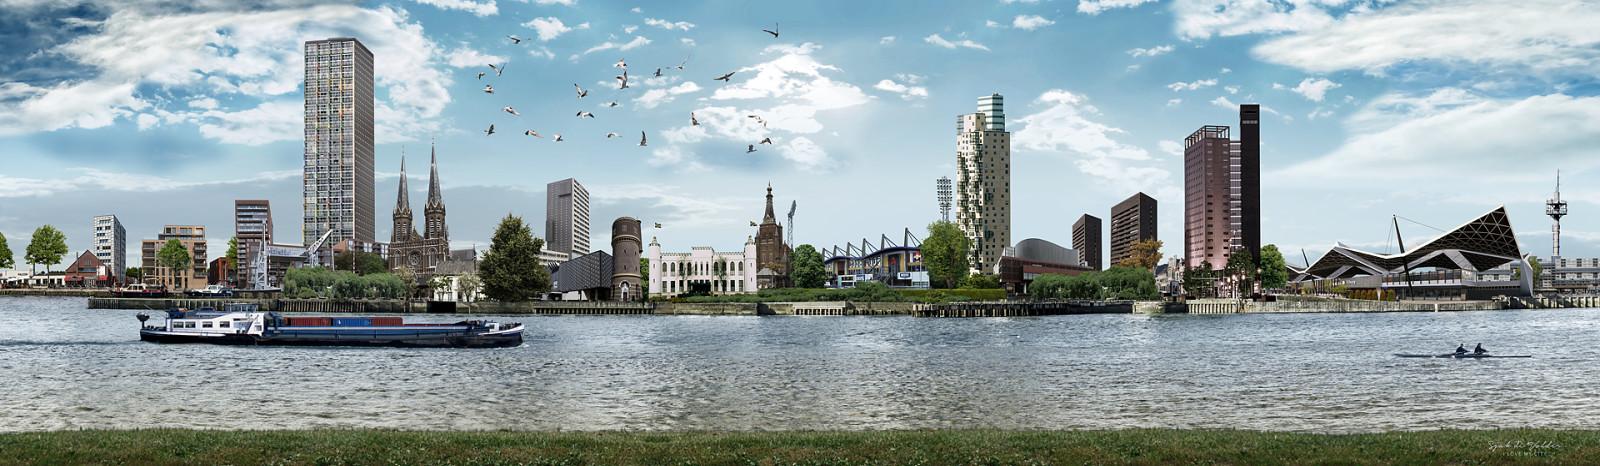 skyline Tilburg Piushaven